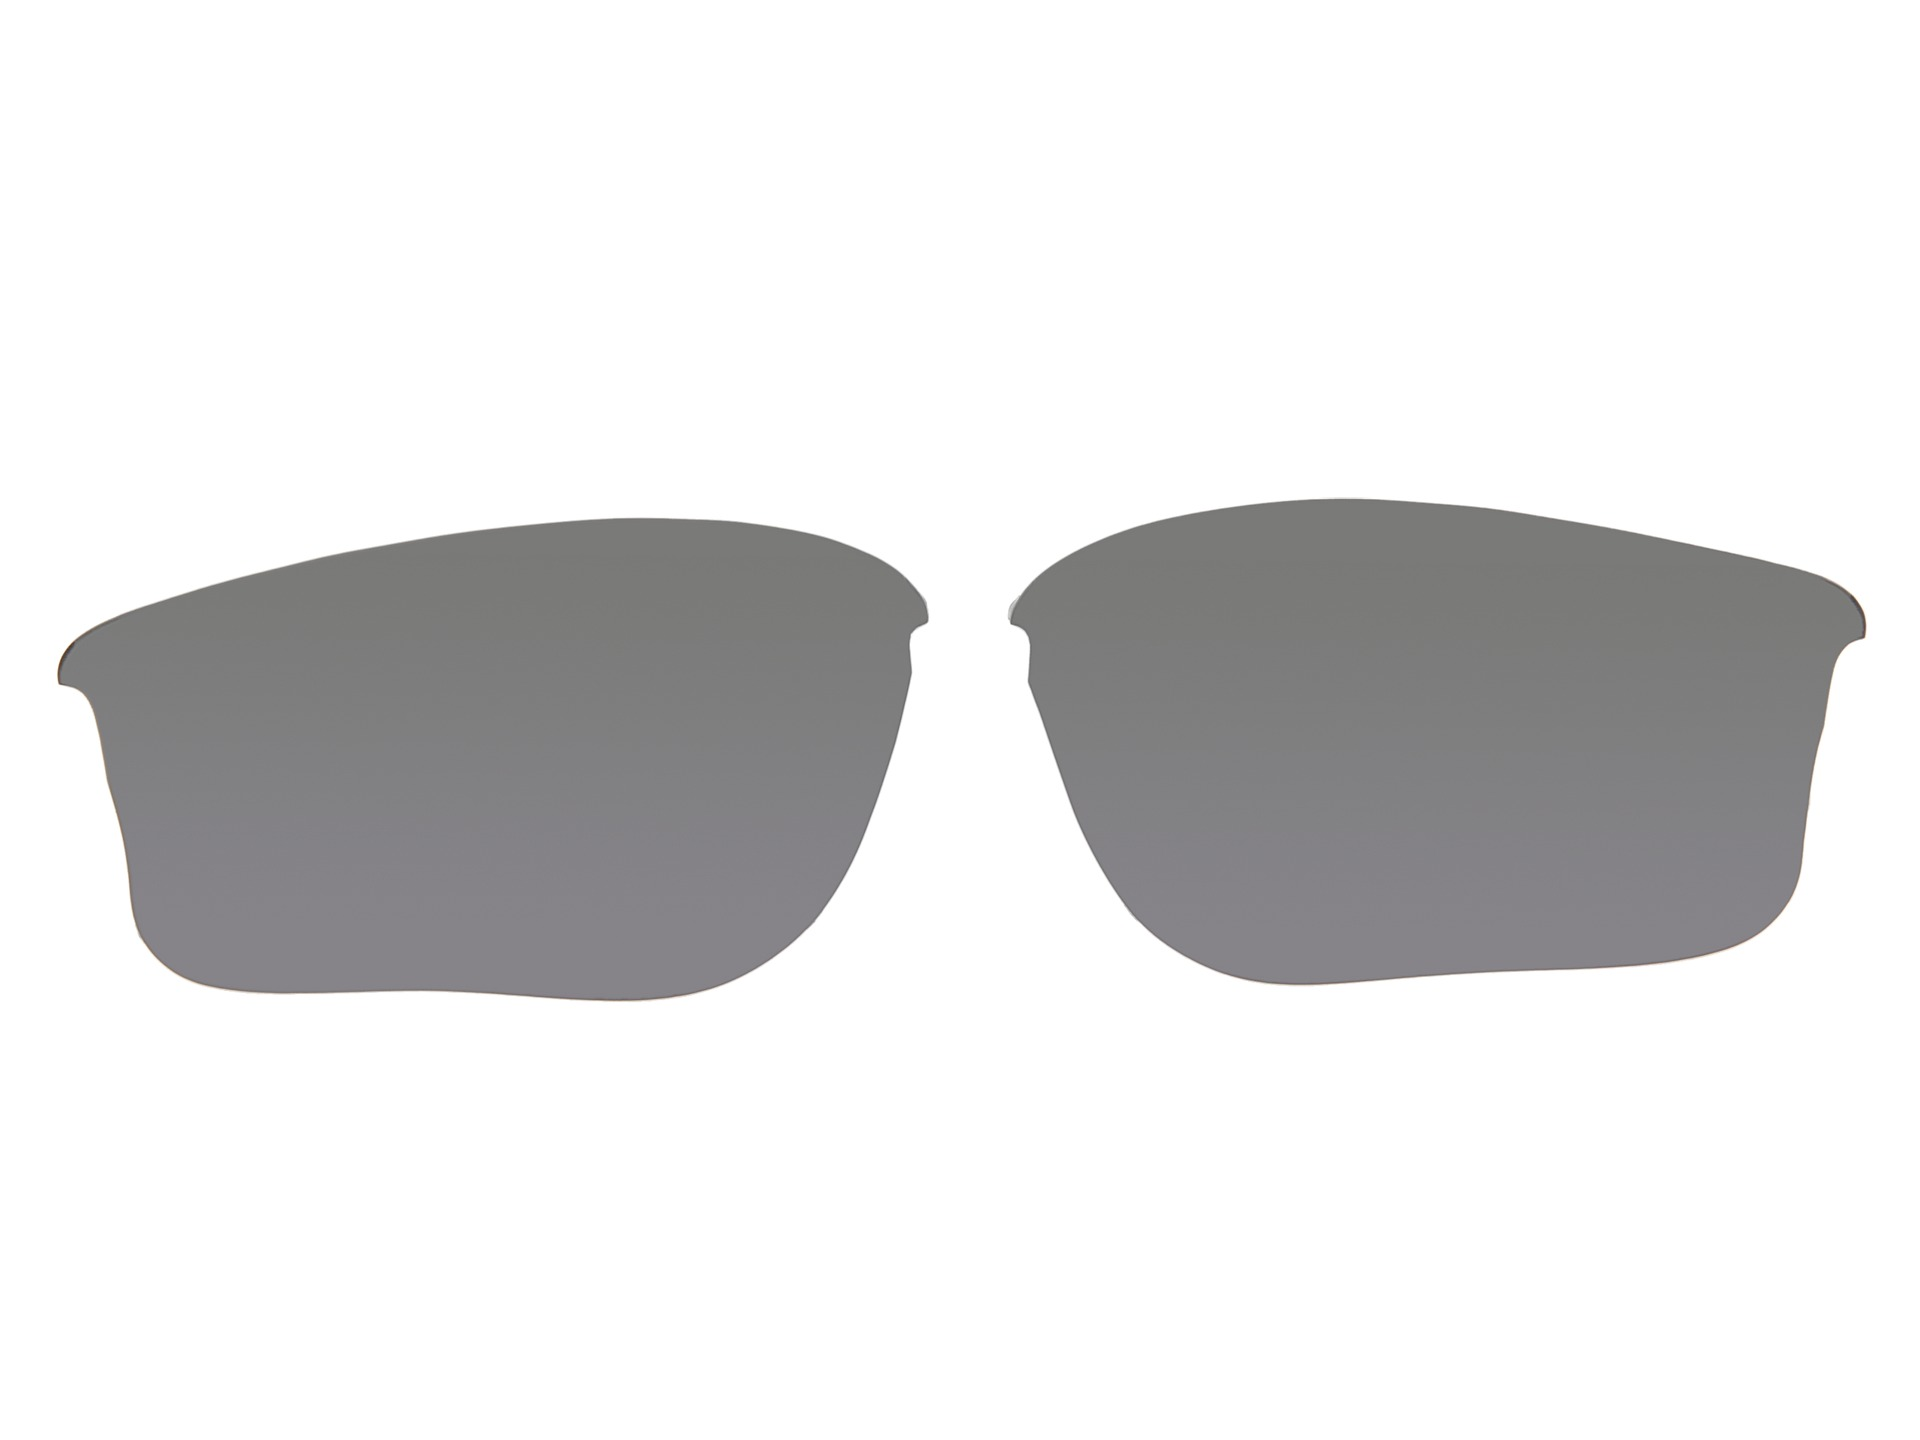 fast jacket oakley lenses 3mnq  fast jacket oakley lenses